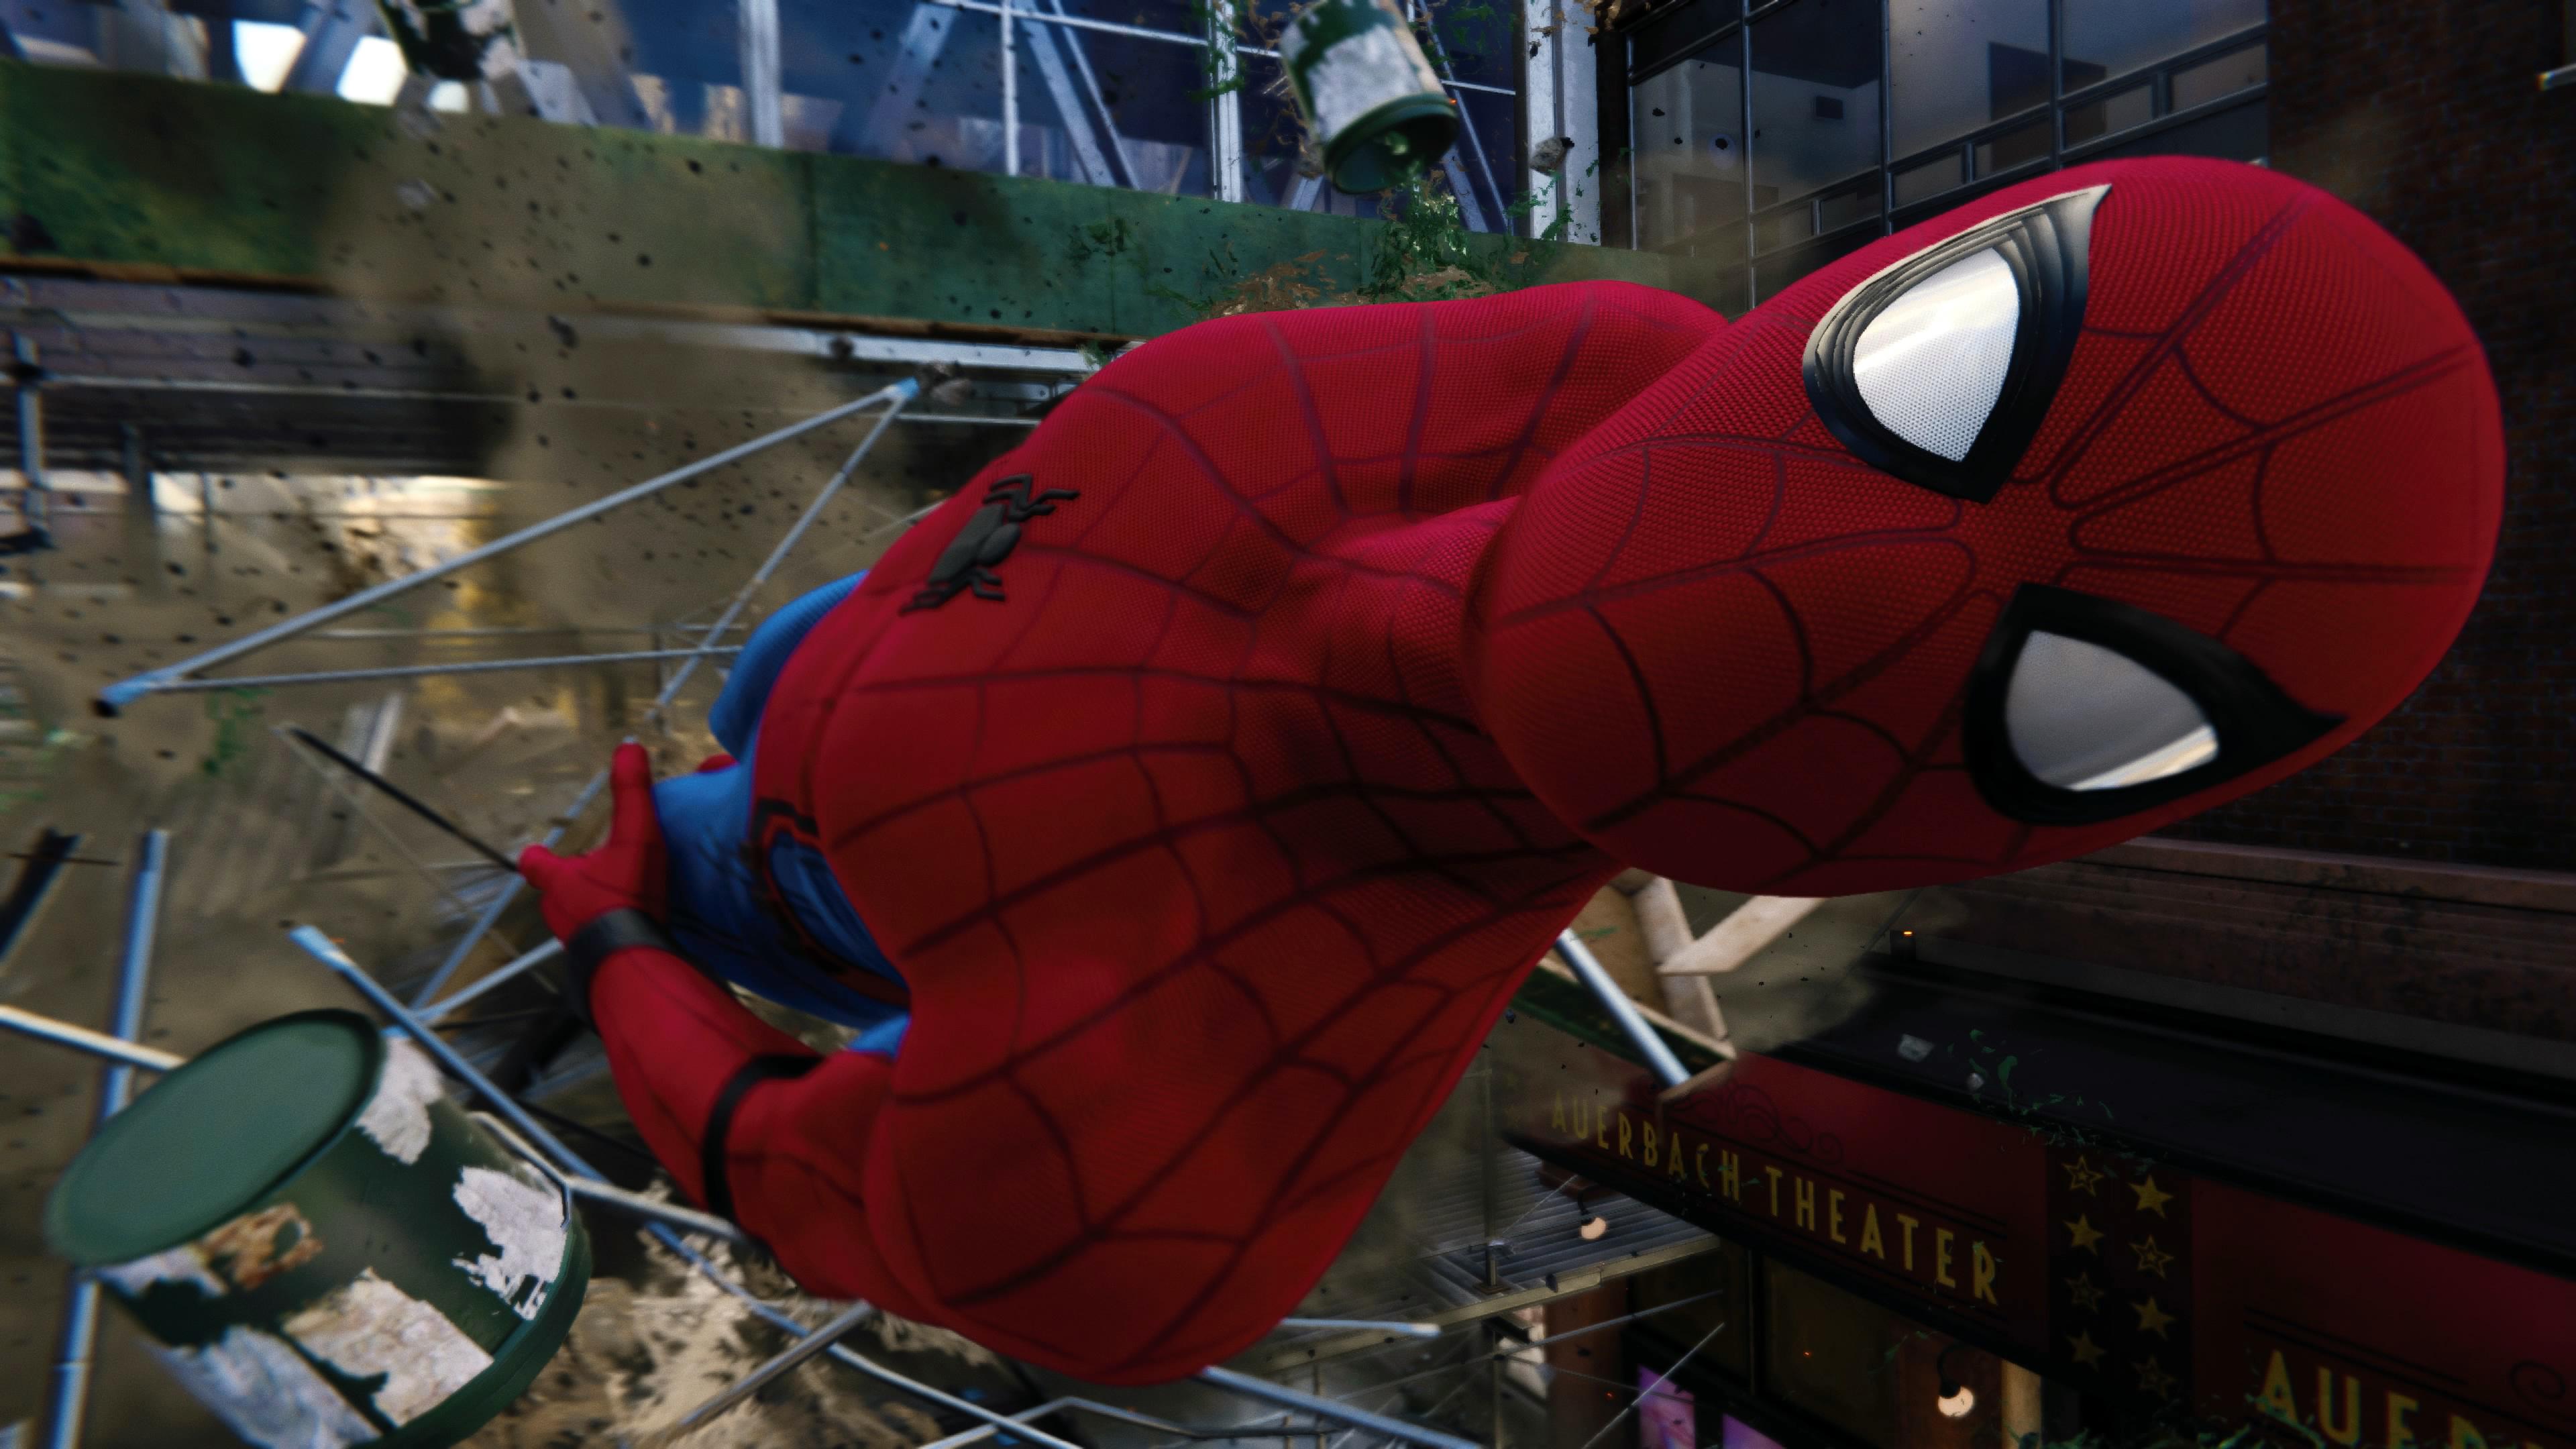 marvels-spiderman-ps4-x7521.jpg